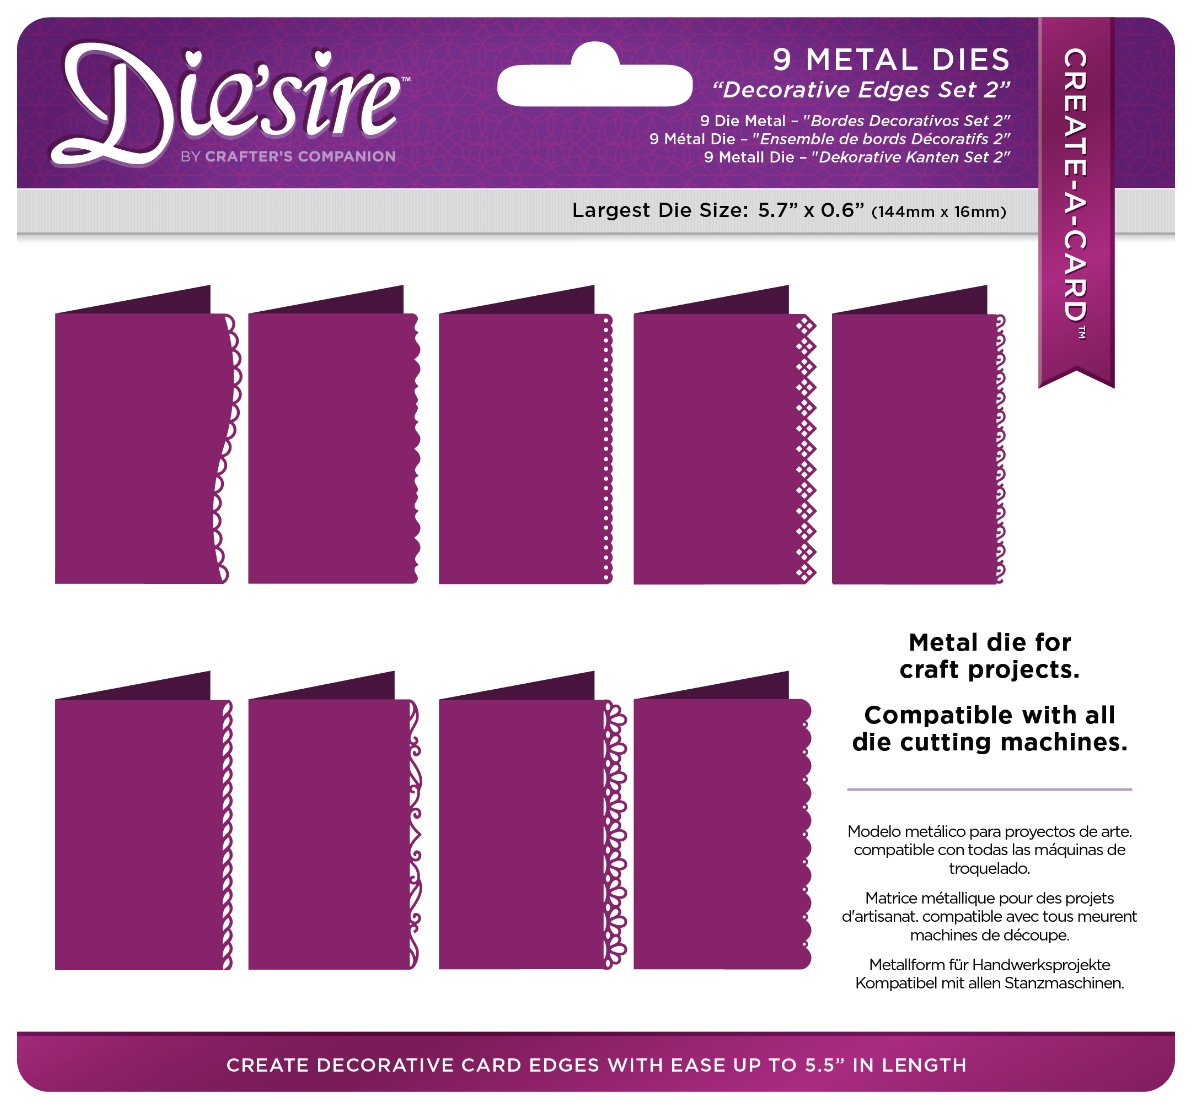 Silver Diesire DS-CADUS-EDGE2 Thin Metal Die